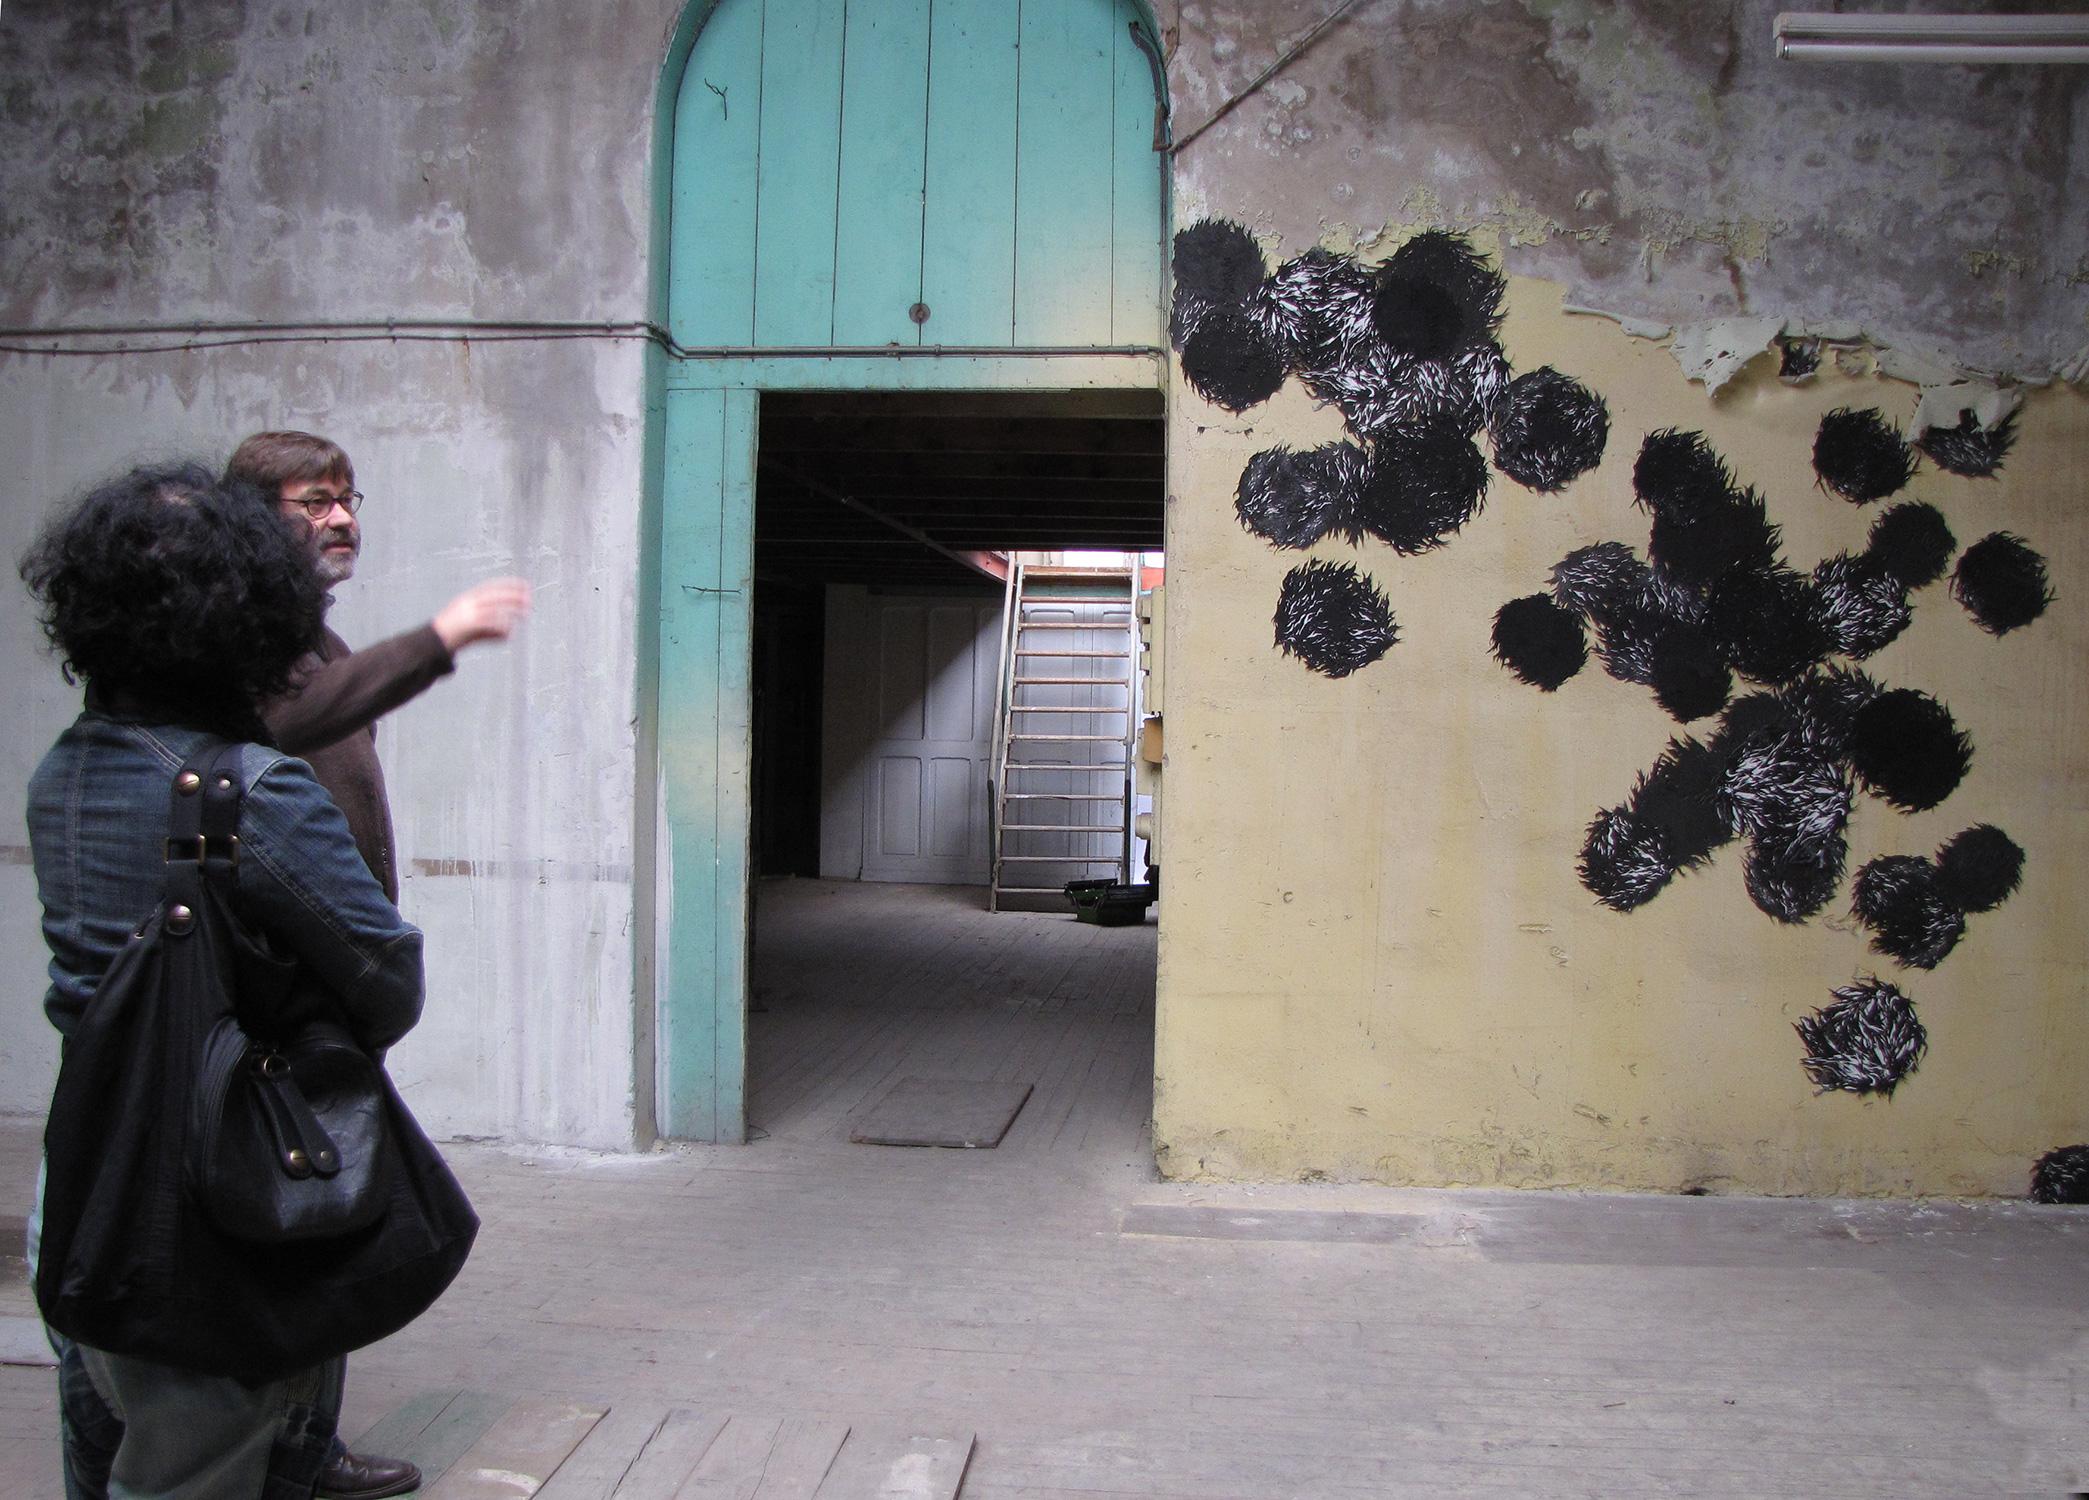 <i>Les choses noires</i>, 2010